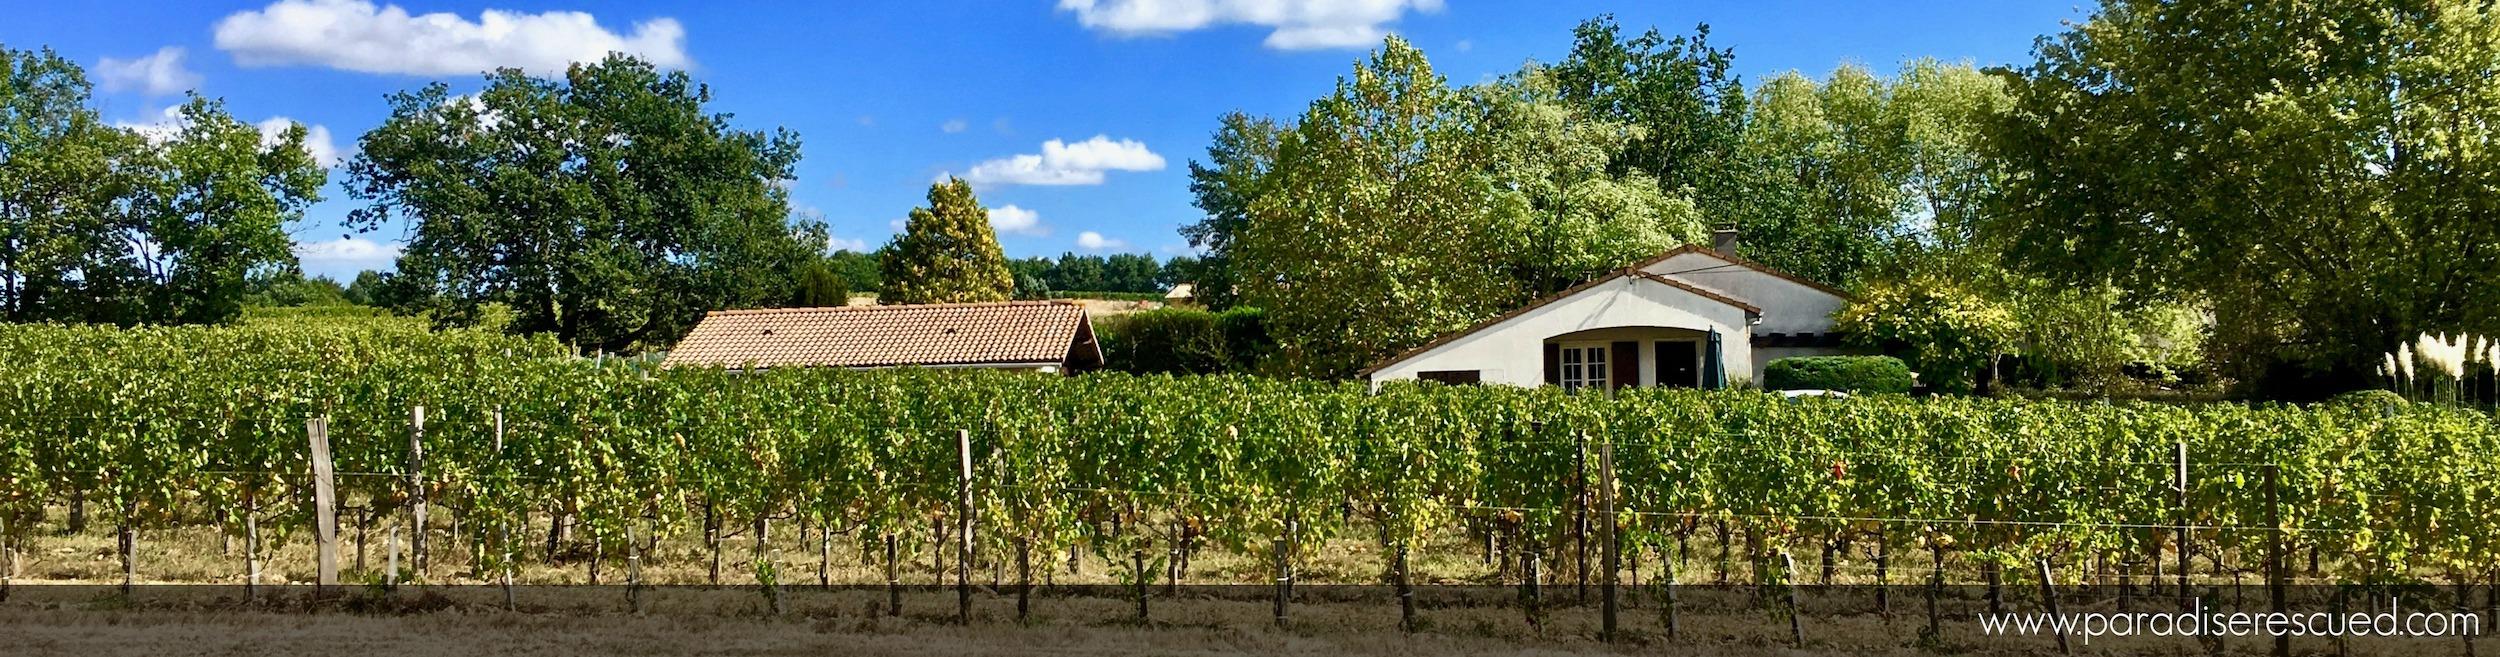 Paradise Rescued across the new Bordeaux Merlot vineyard